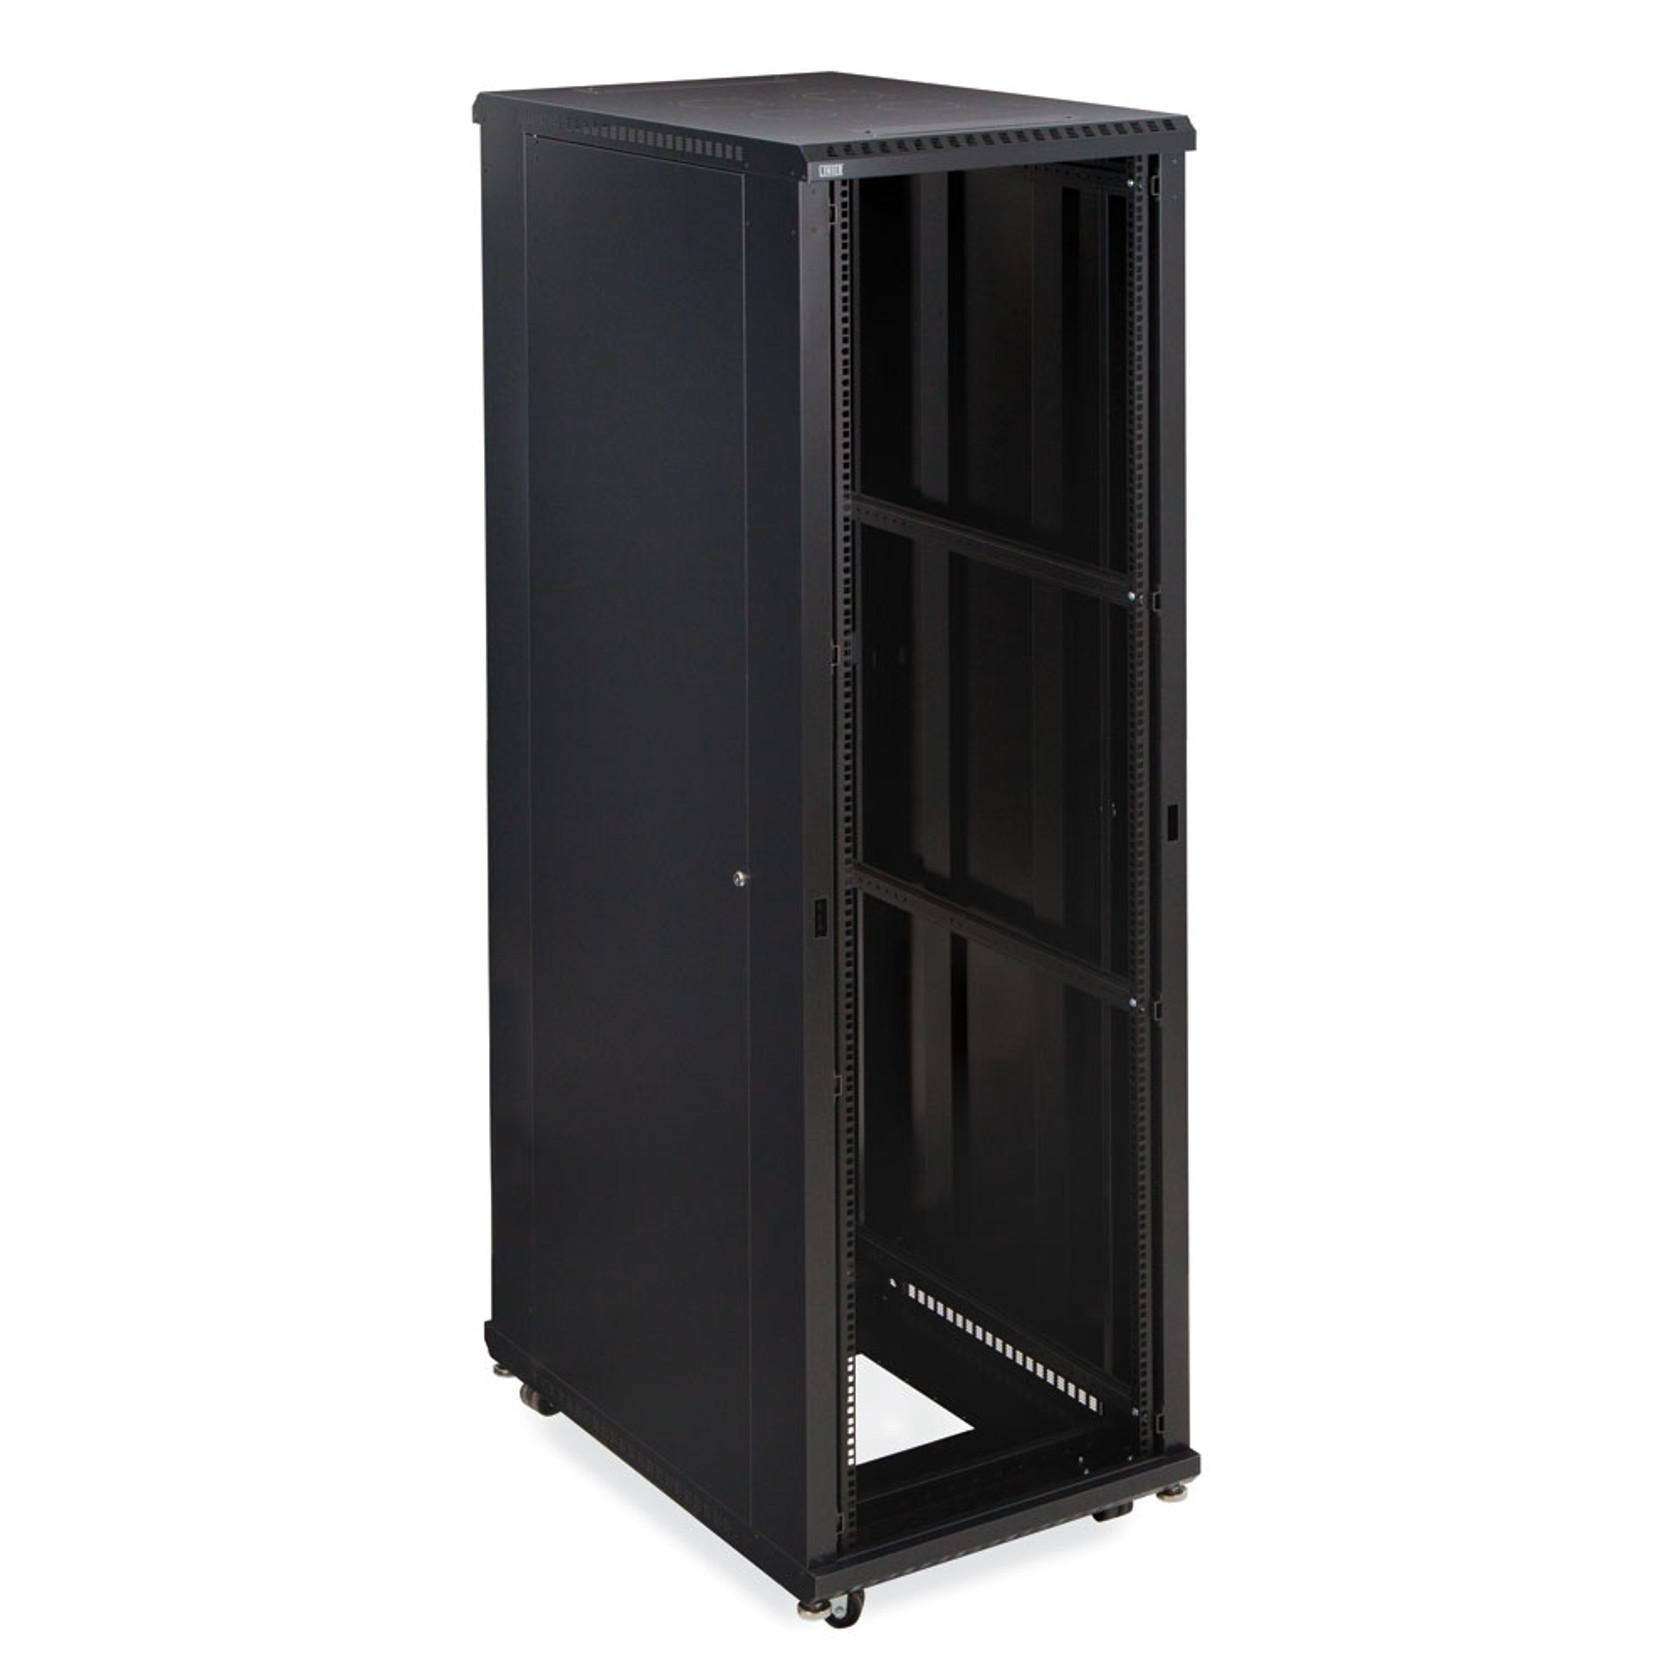 LINIER® Server Cabinets & Accessories